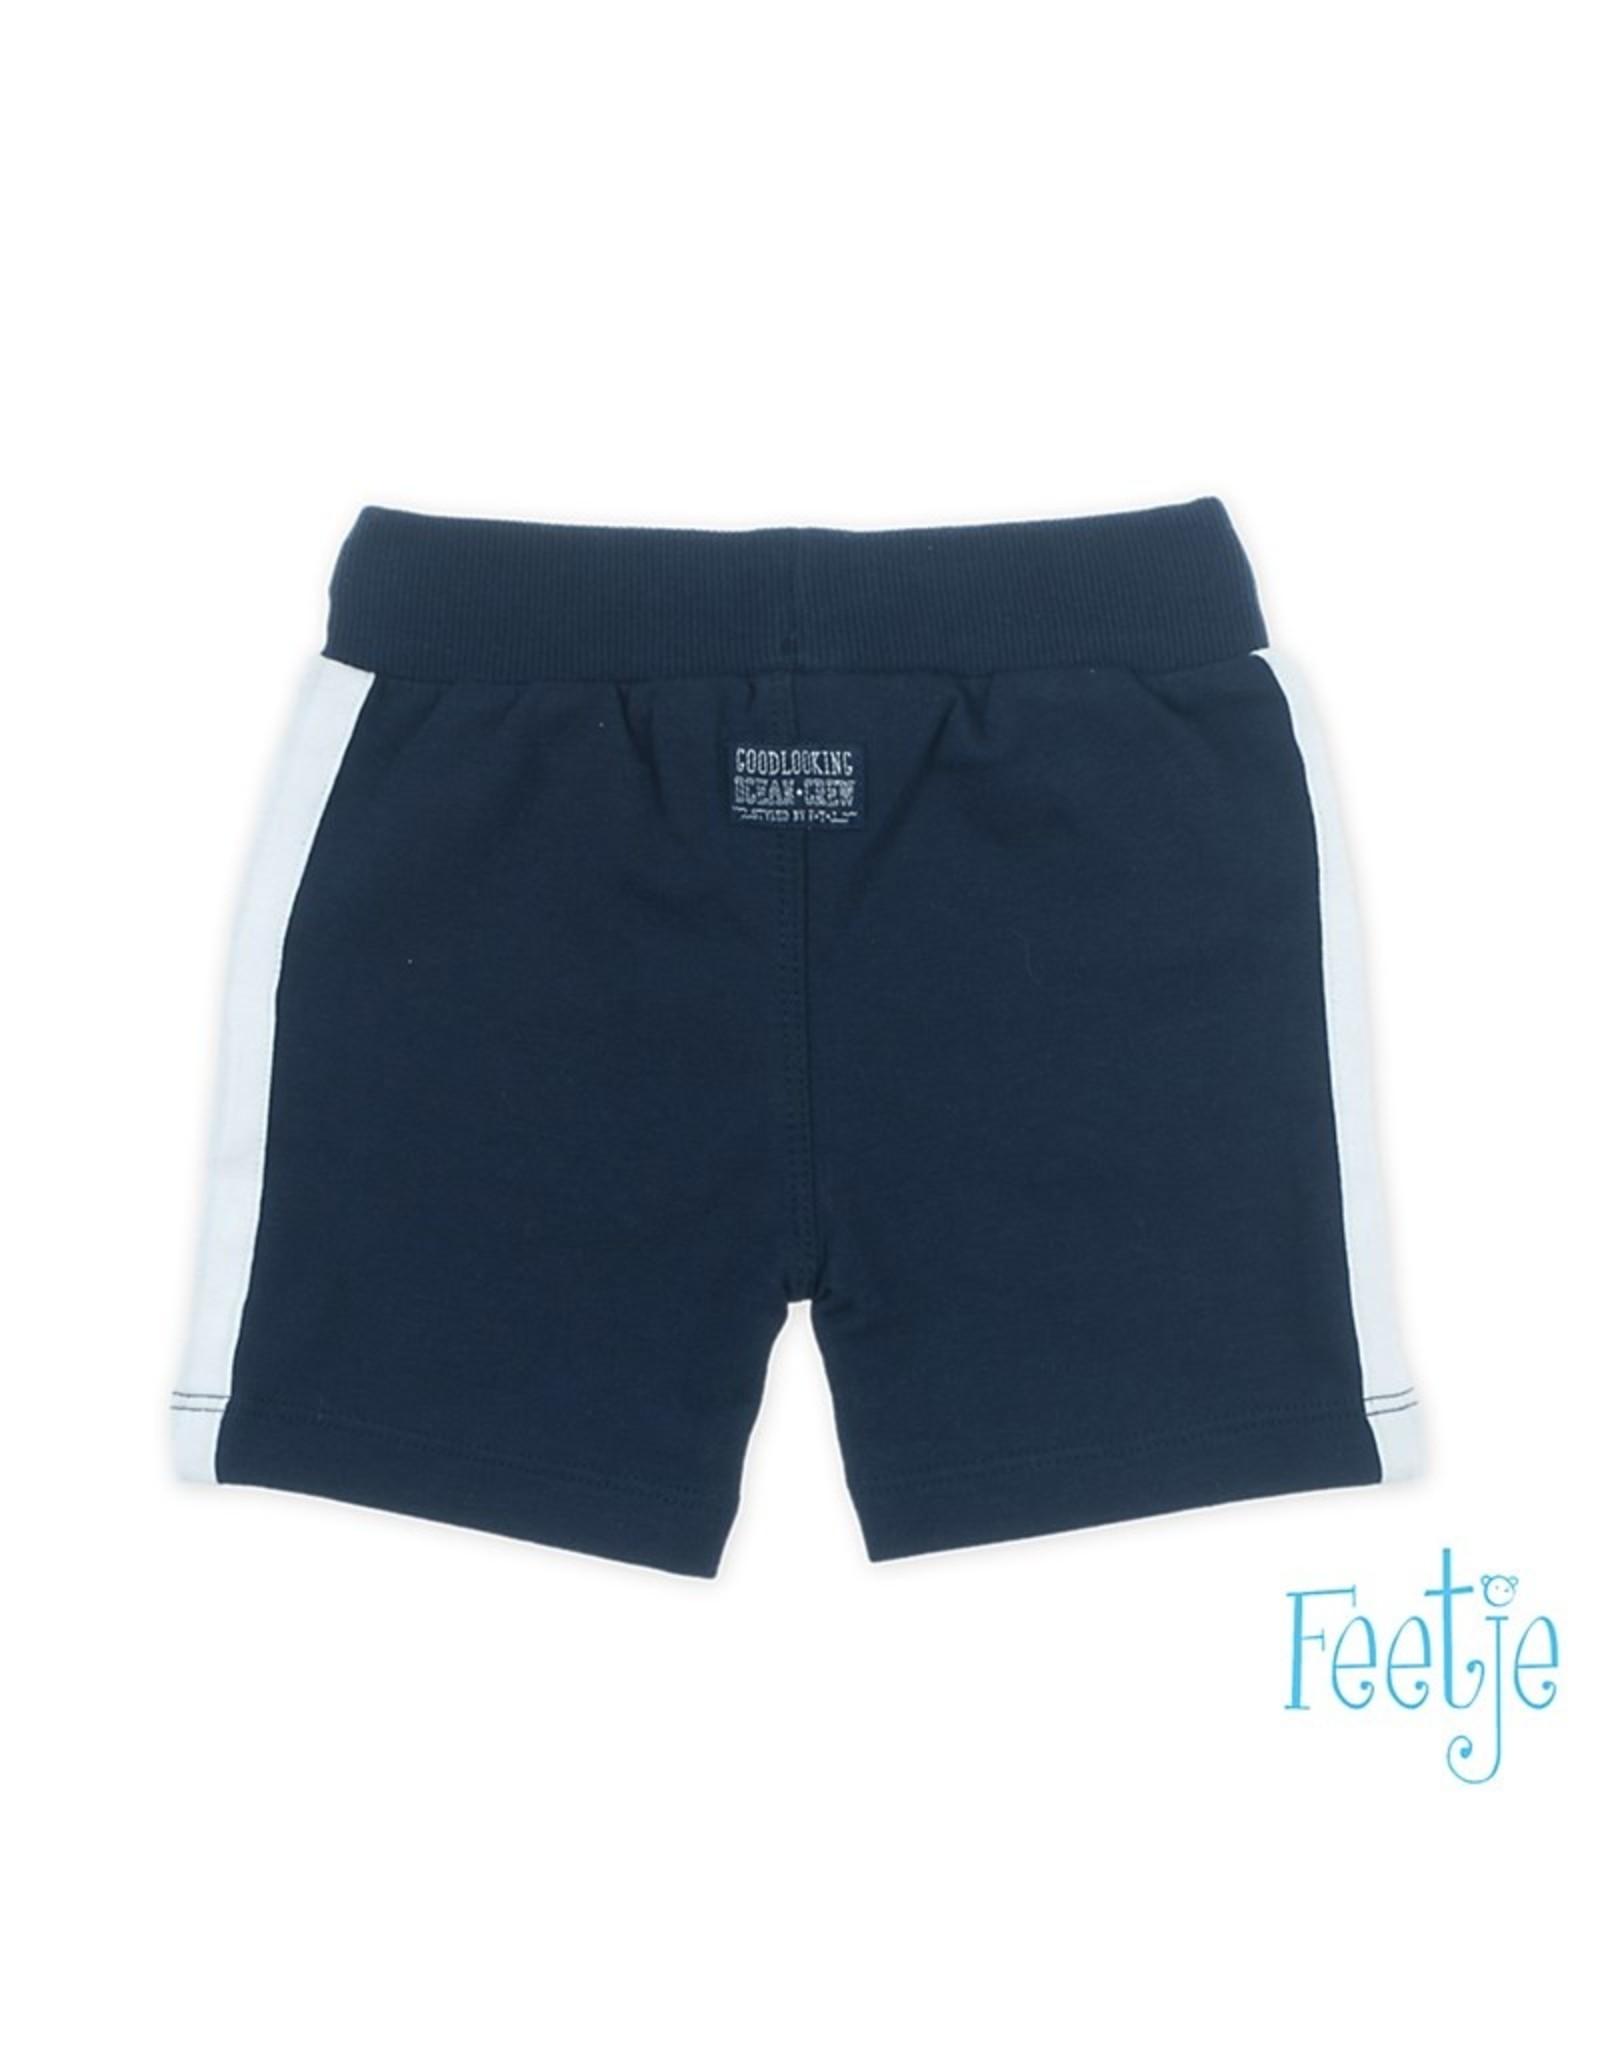 Feetje Short - Mr. Good Looks maat 56